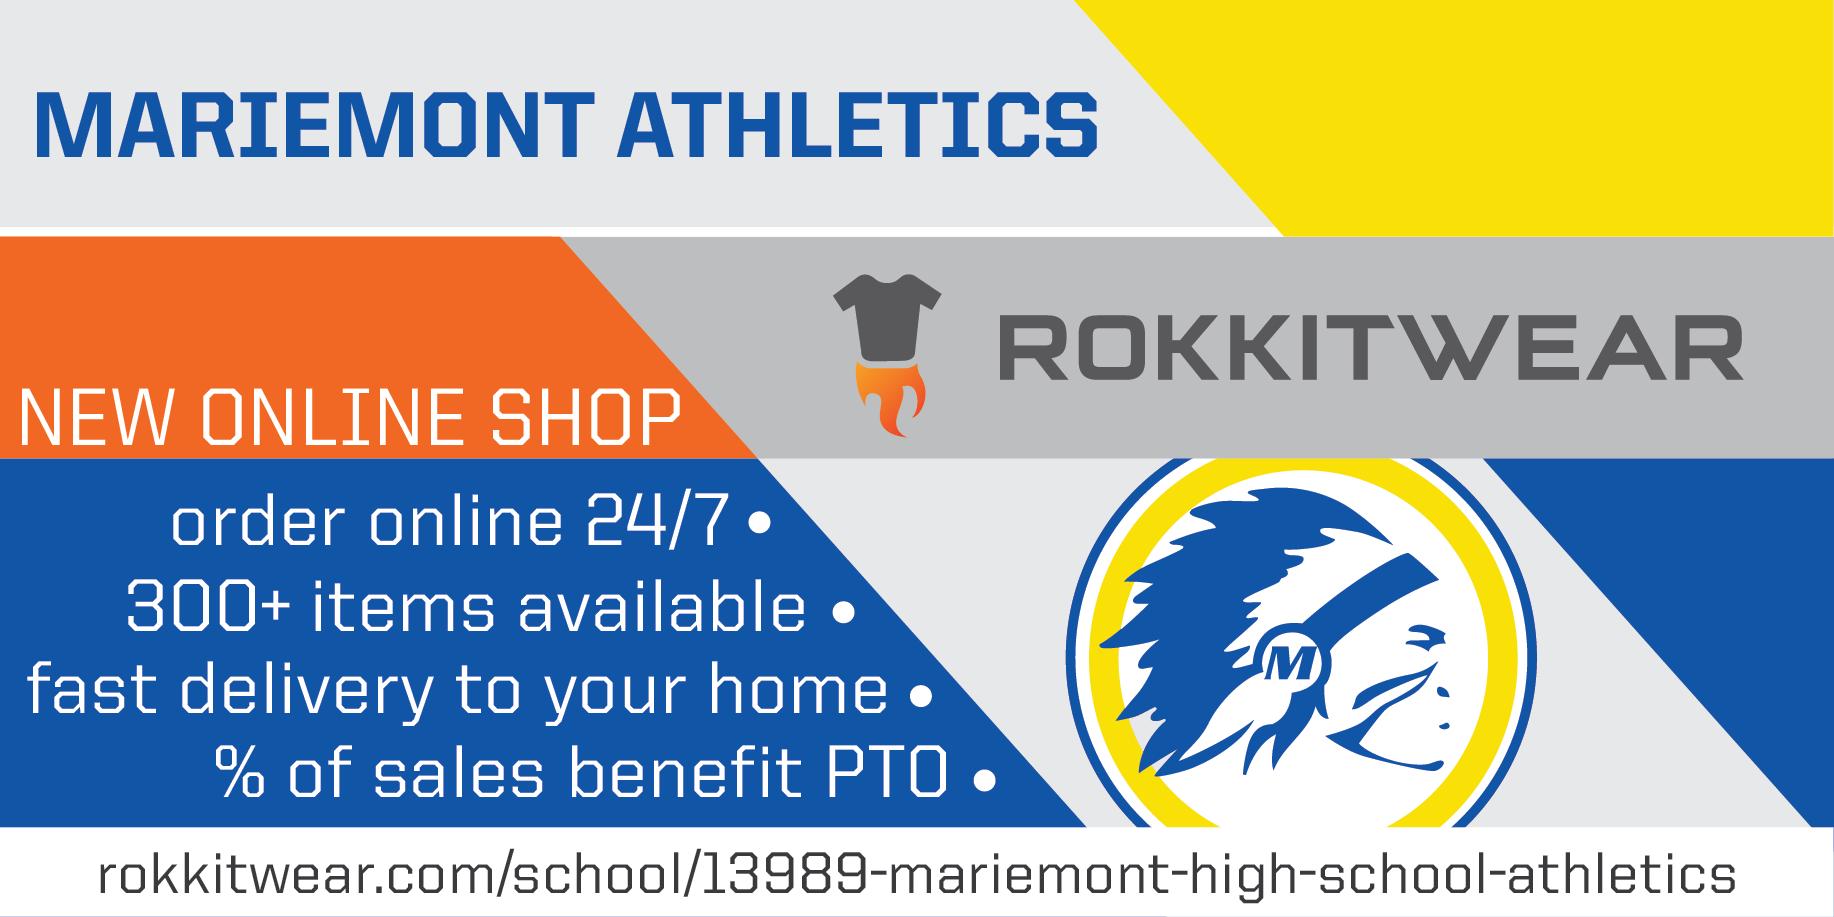 Rokkitwear advertisement